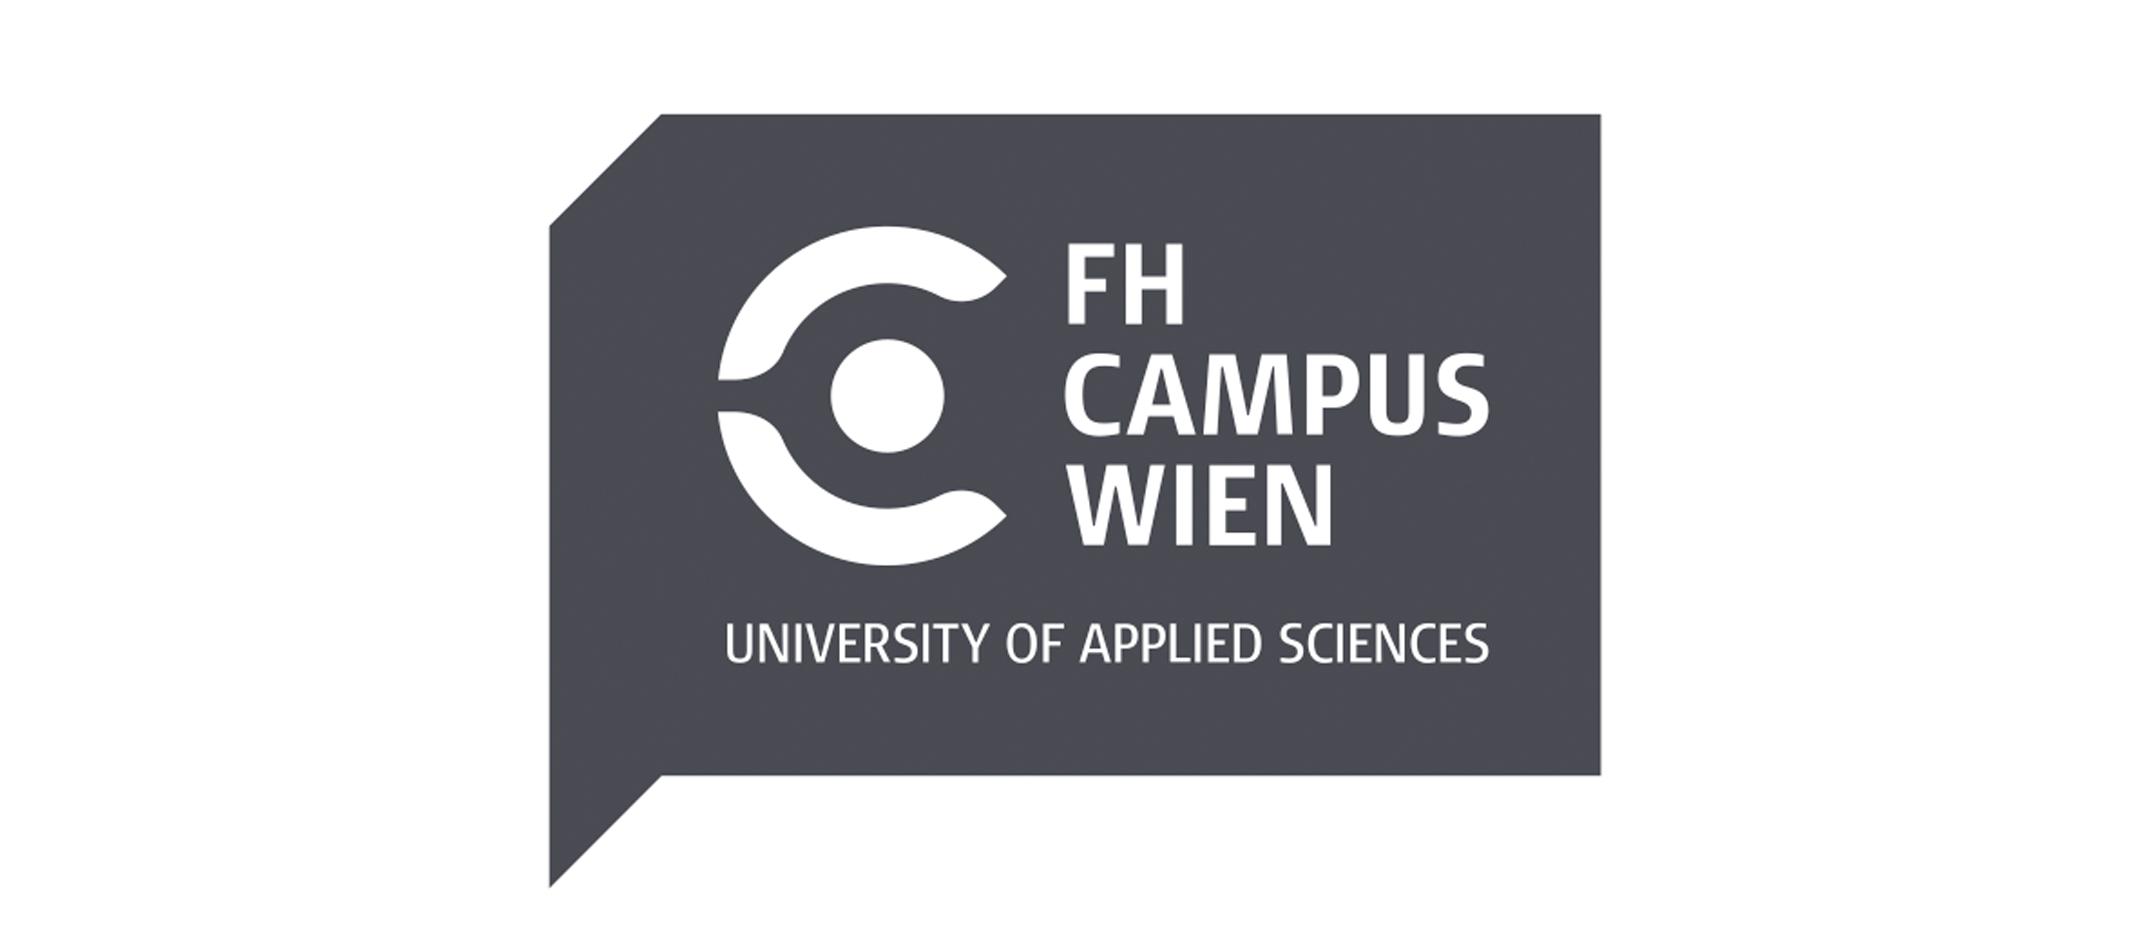 UAS Campus Wien